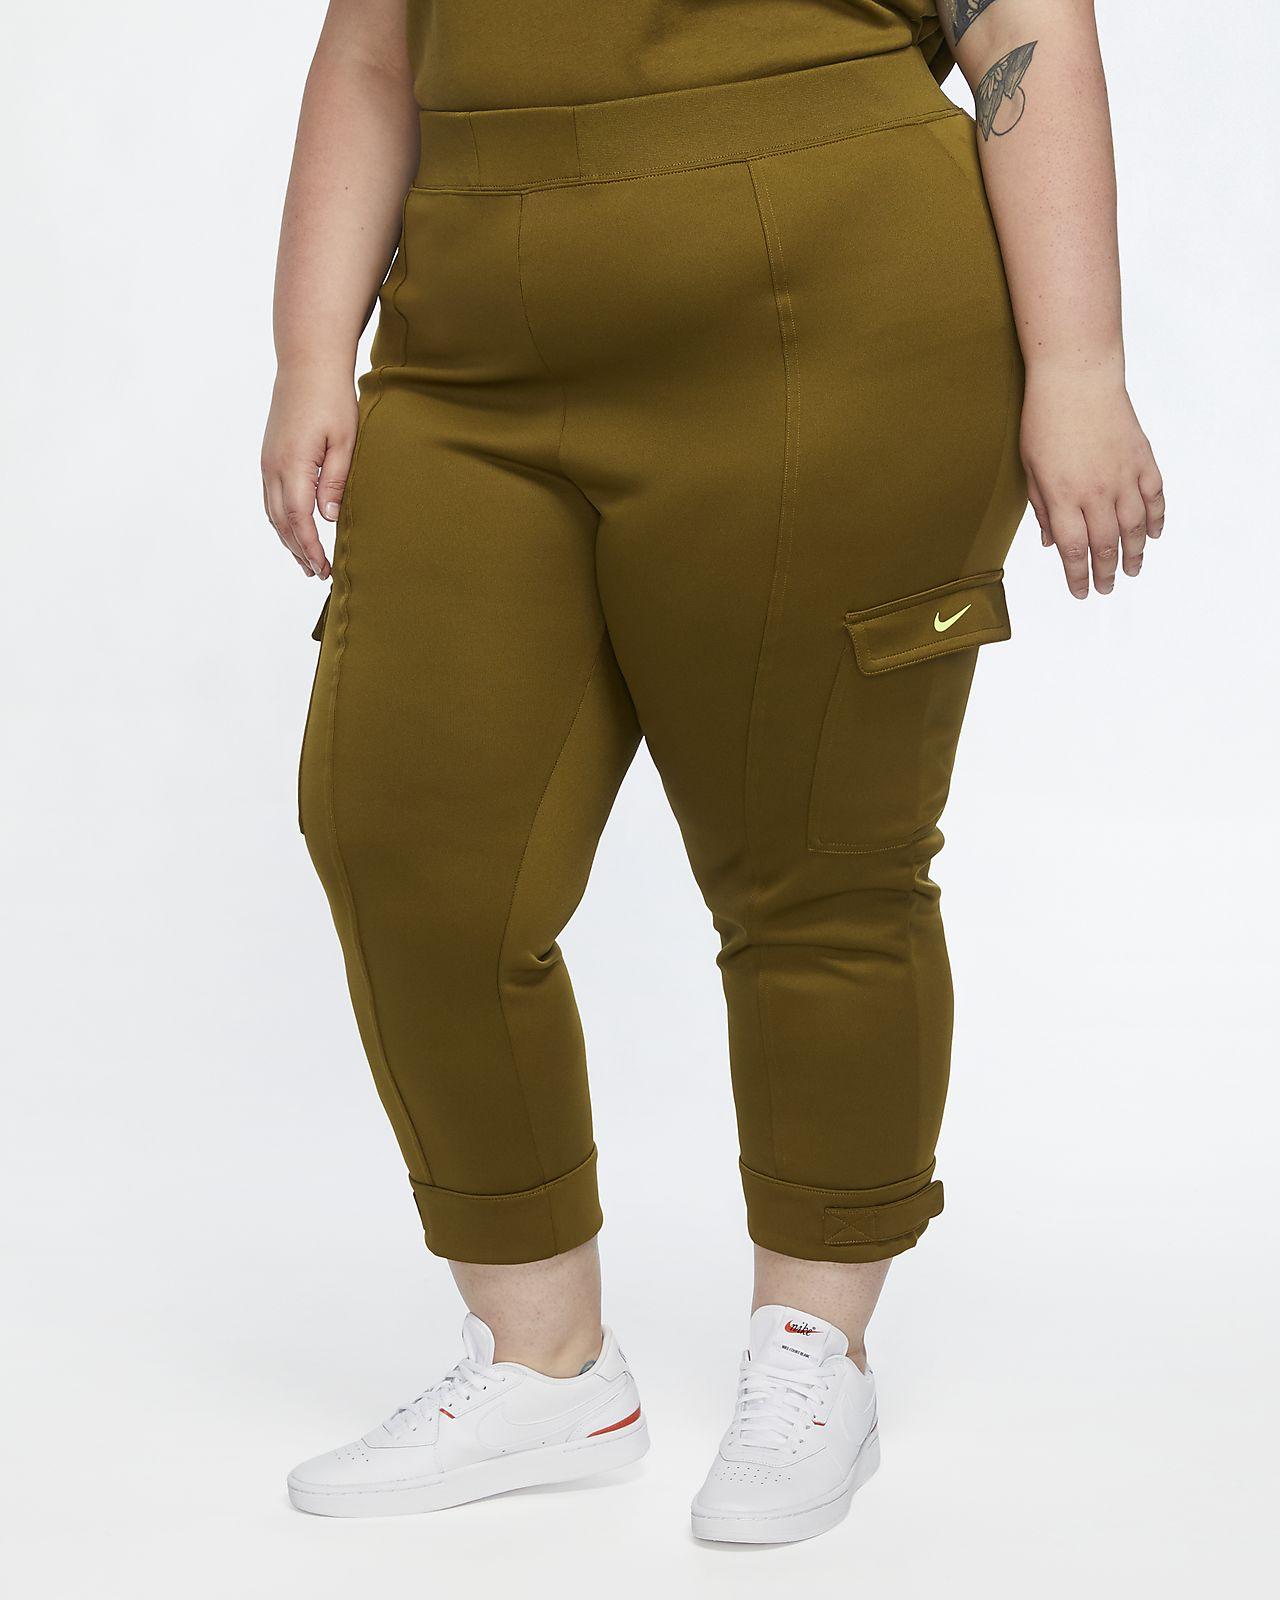 Pantalon PolyKnit Nike Sportswear Swoosh pour Femme (grande taille)